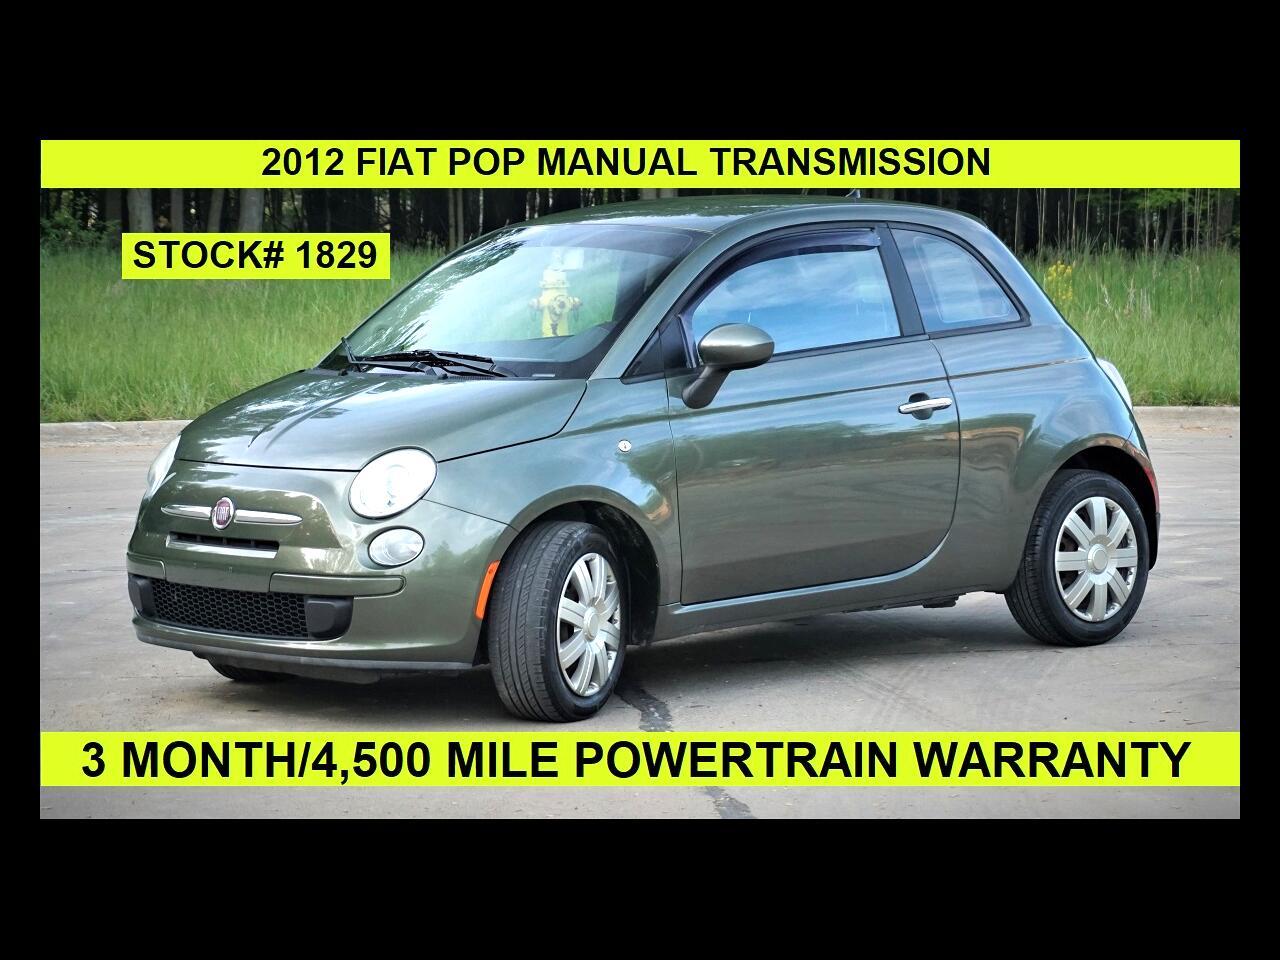 Fiat 500 2dr HB Pop 2012